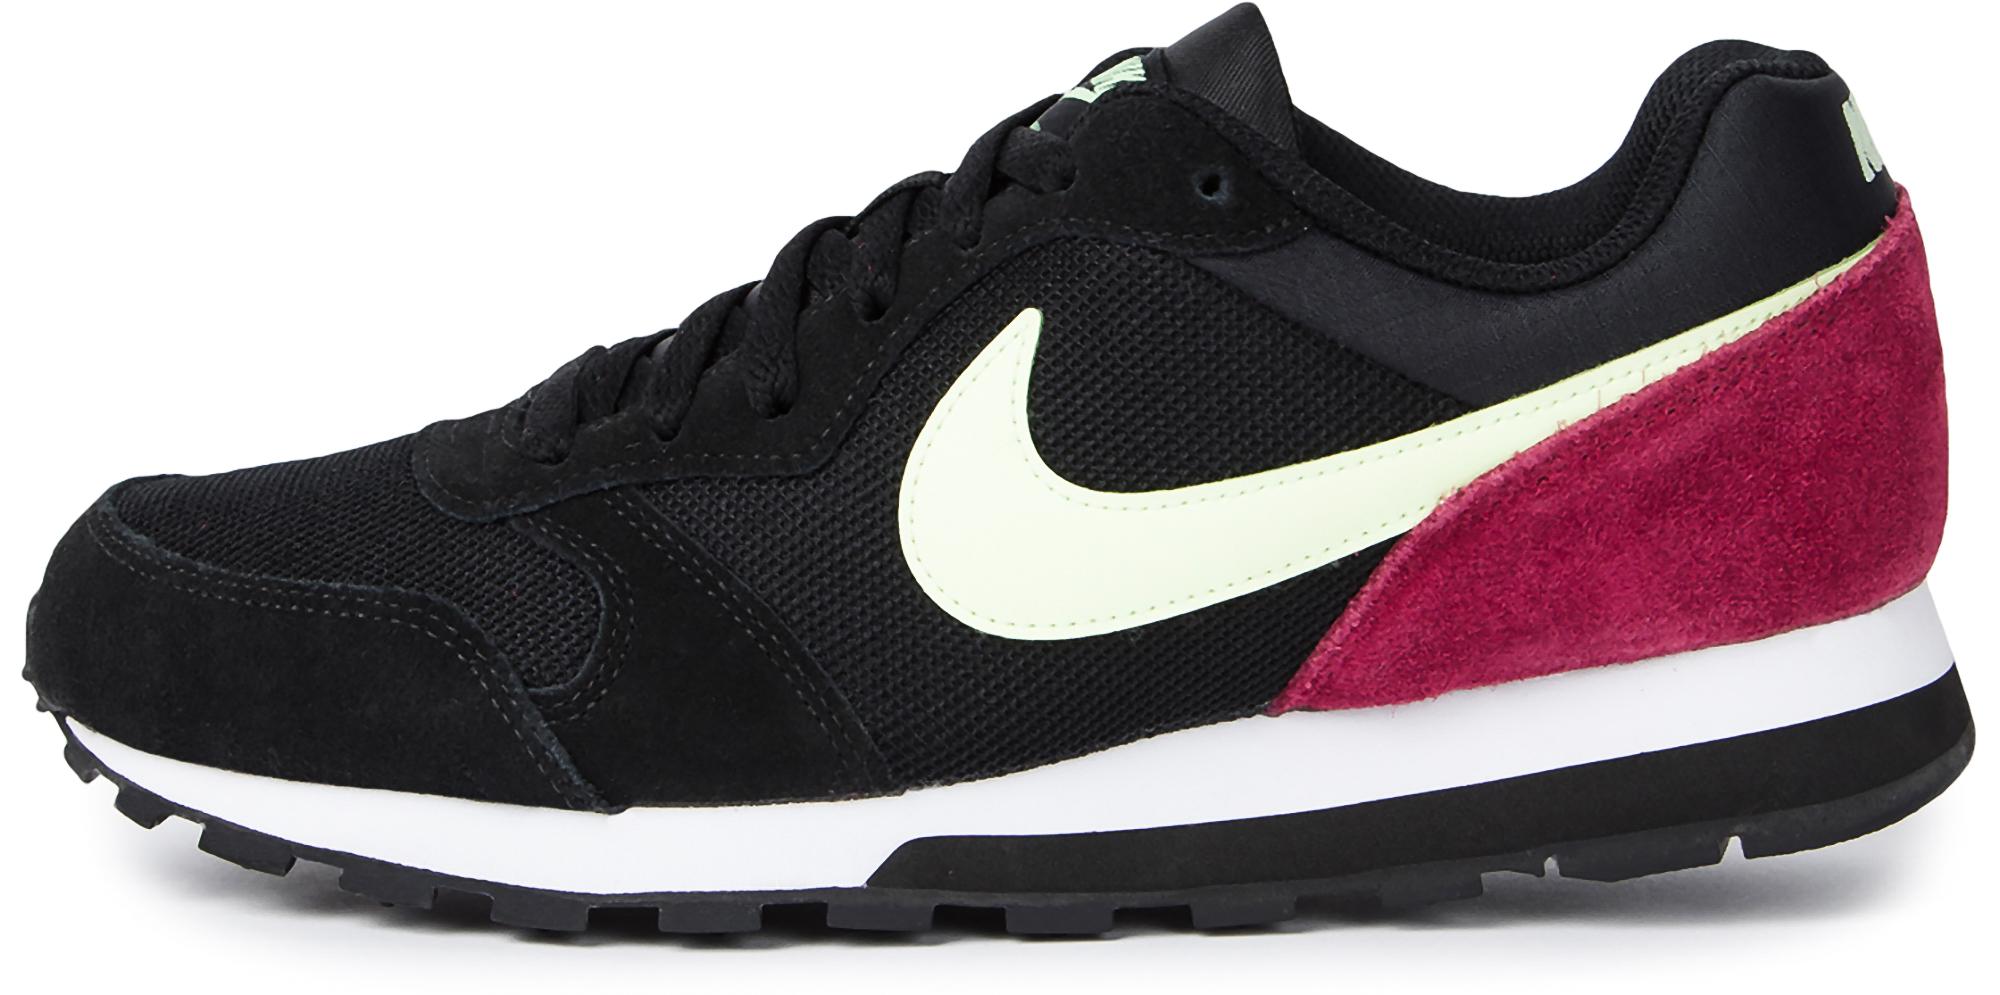 Фото - Nike Кроссовки женские Nike Runner 2, размер 36.5 nike кроссовки женские nike wmns venture runner размер 39